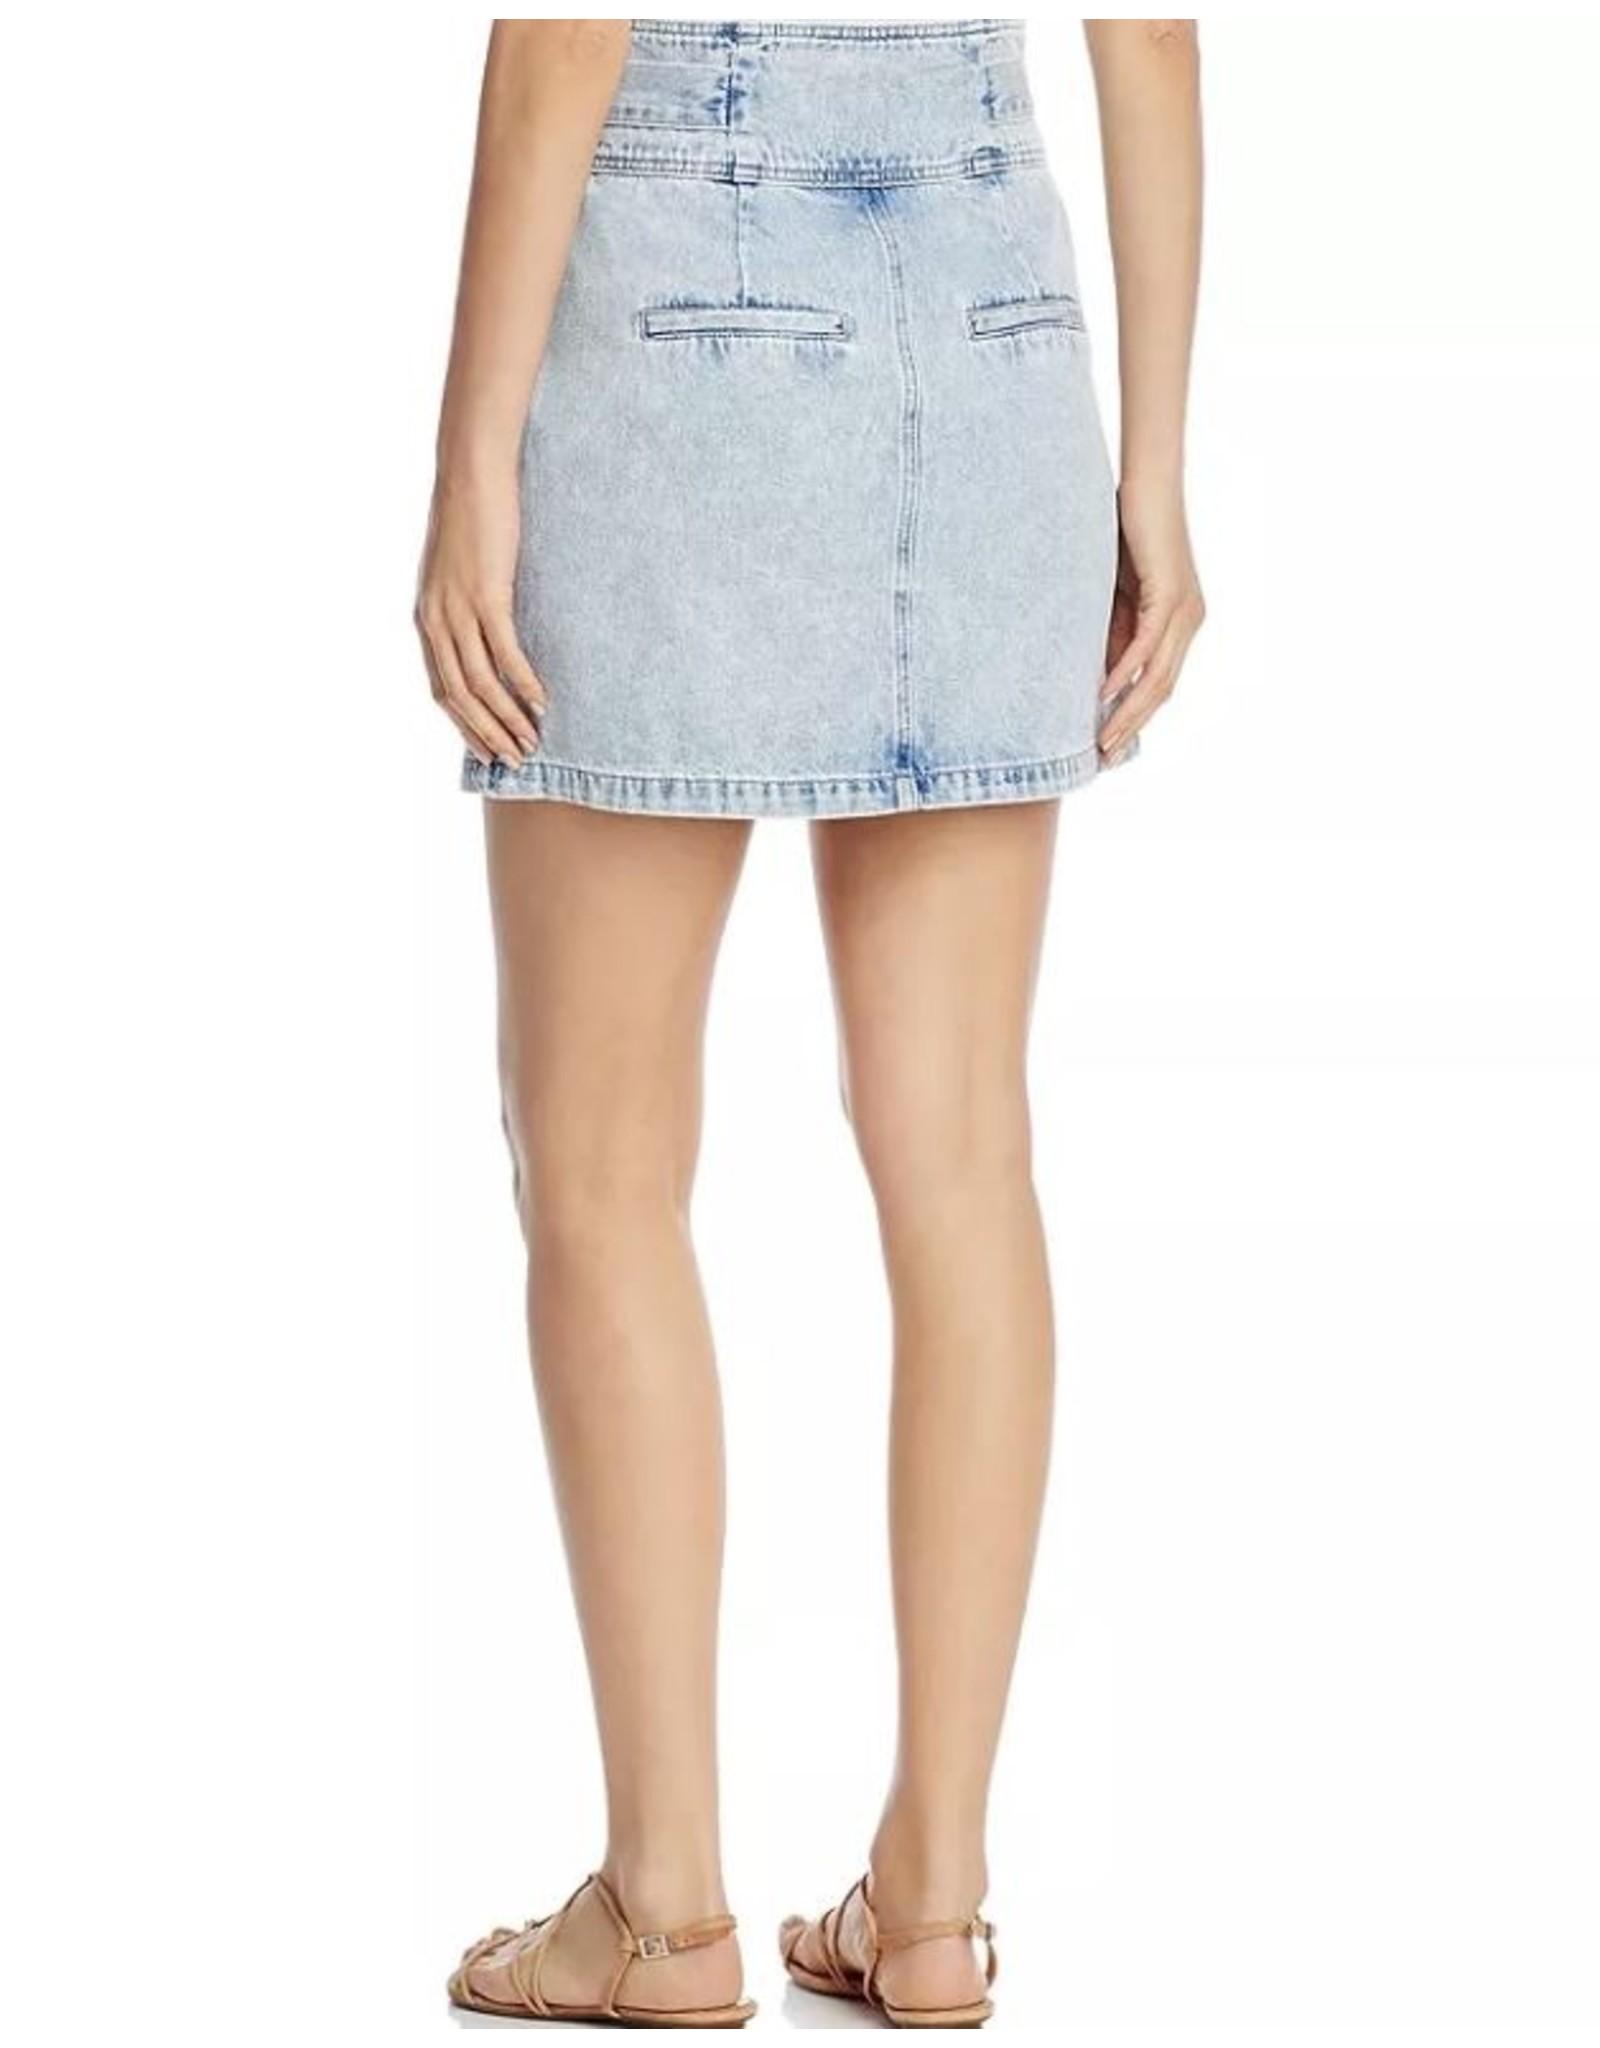 Vero Moda Vero Moda Katie Skirt